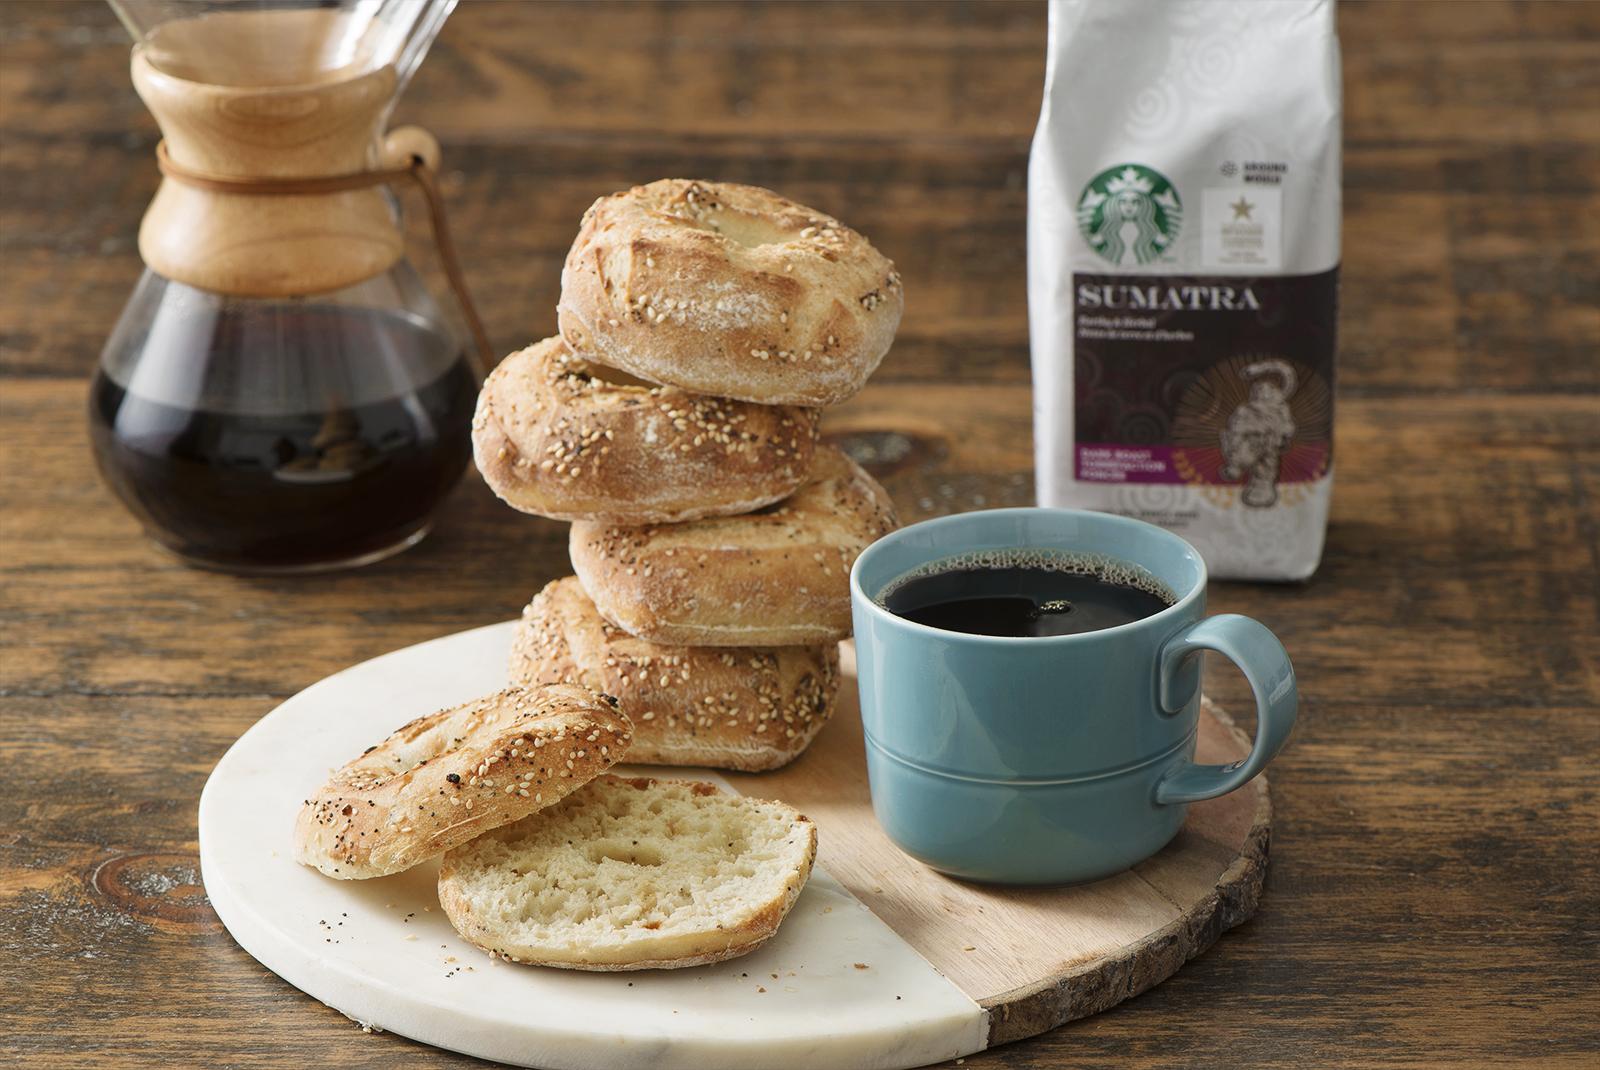 ACE Everything Baguette Bagel + Starbucks Sumatra-042 copy.jpg